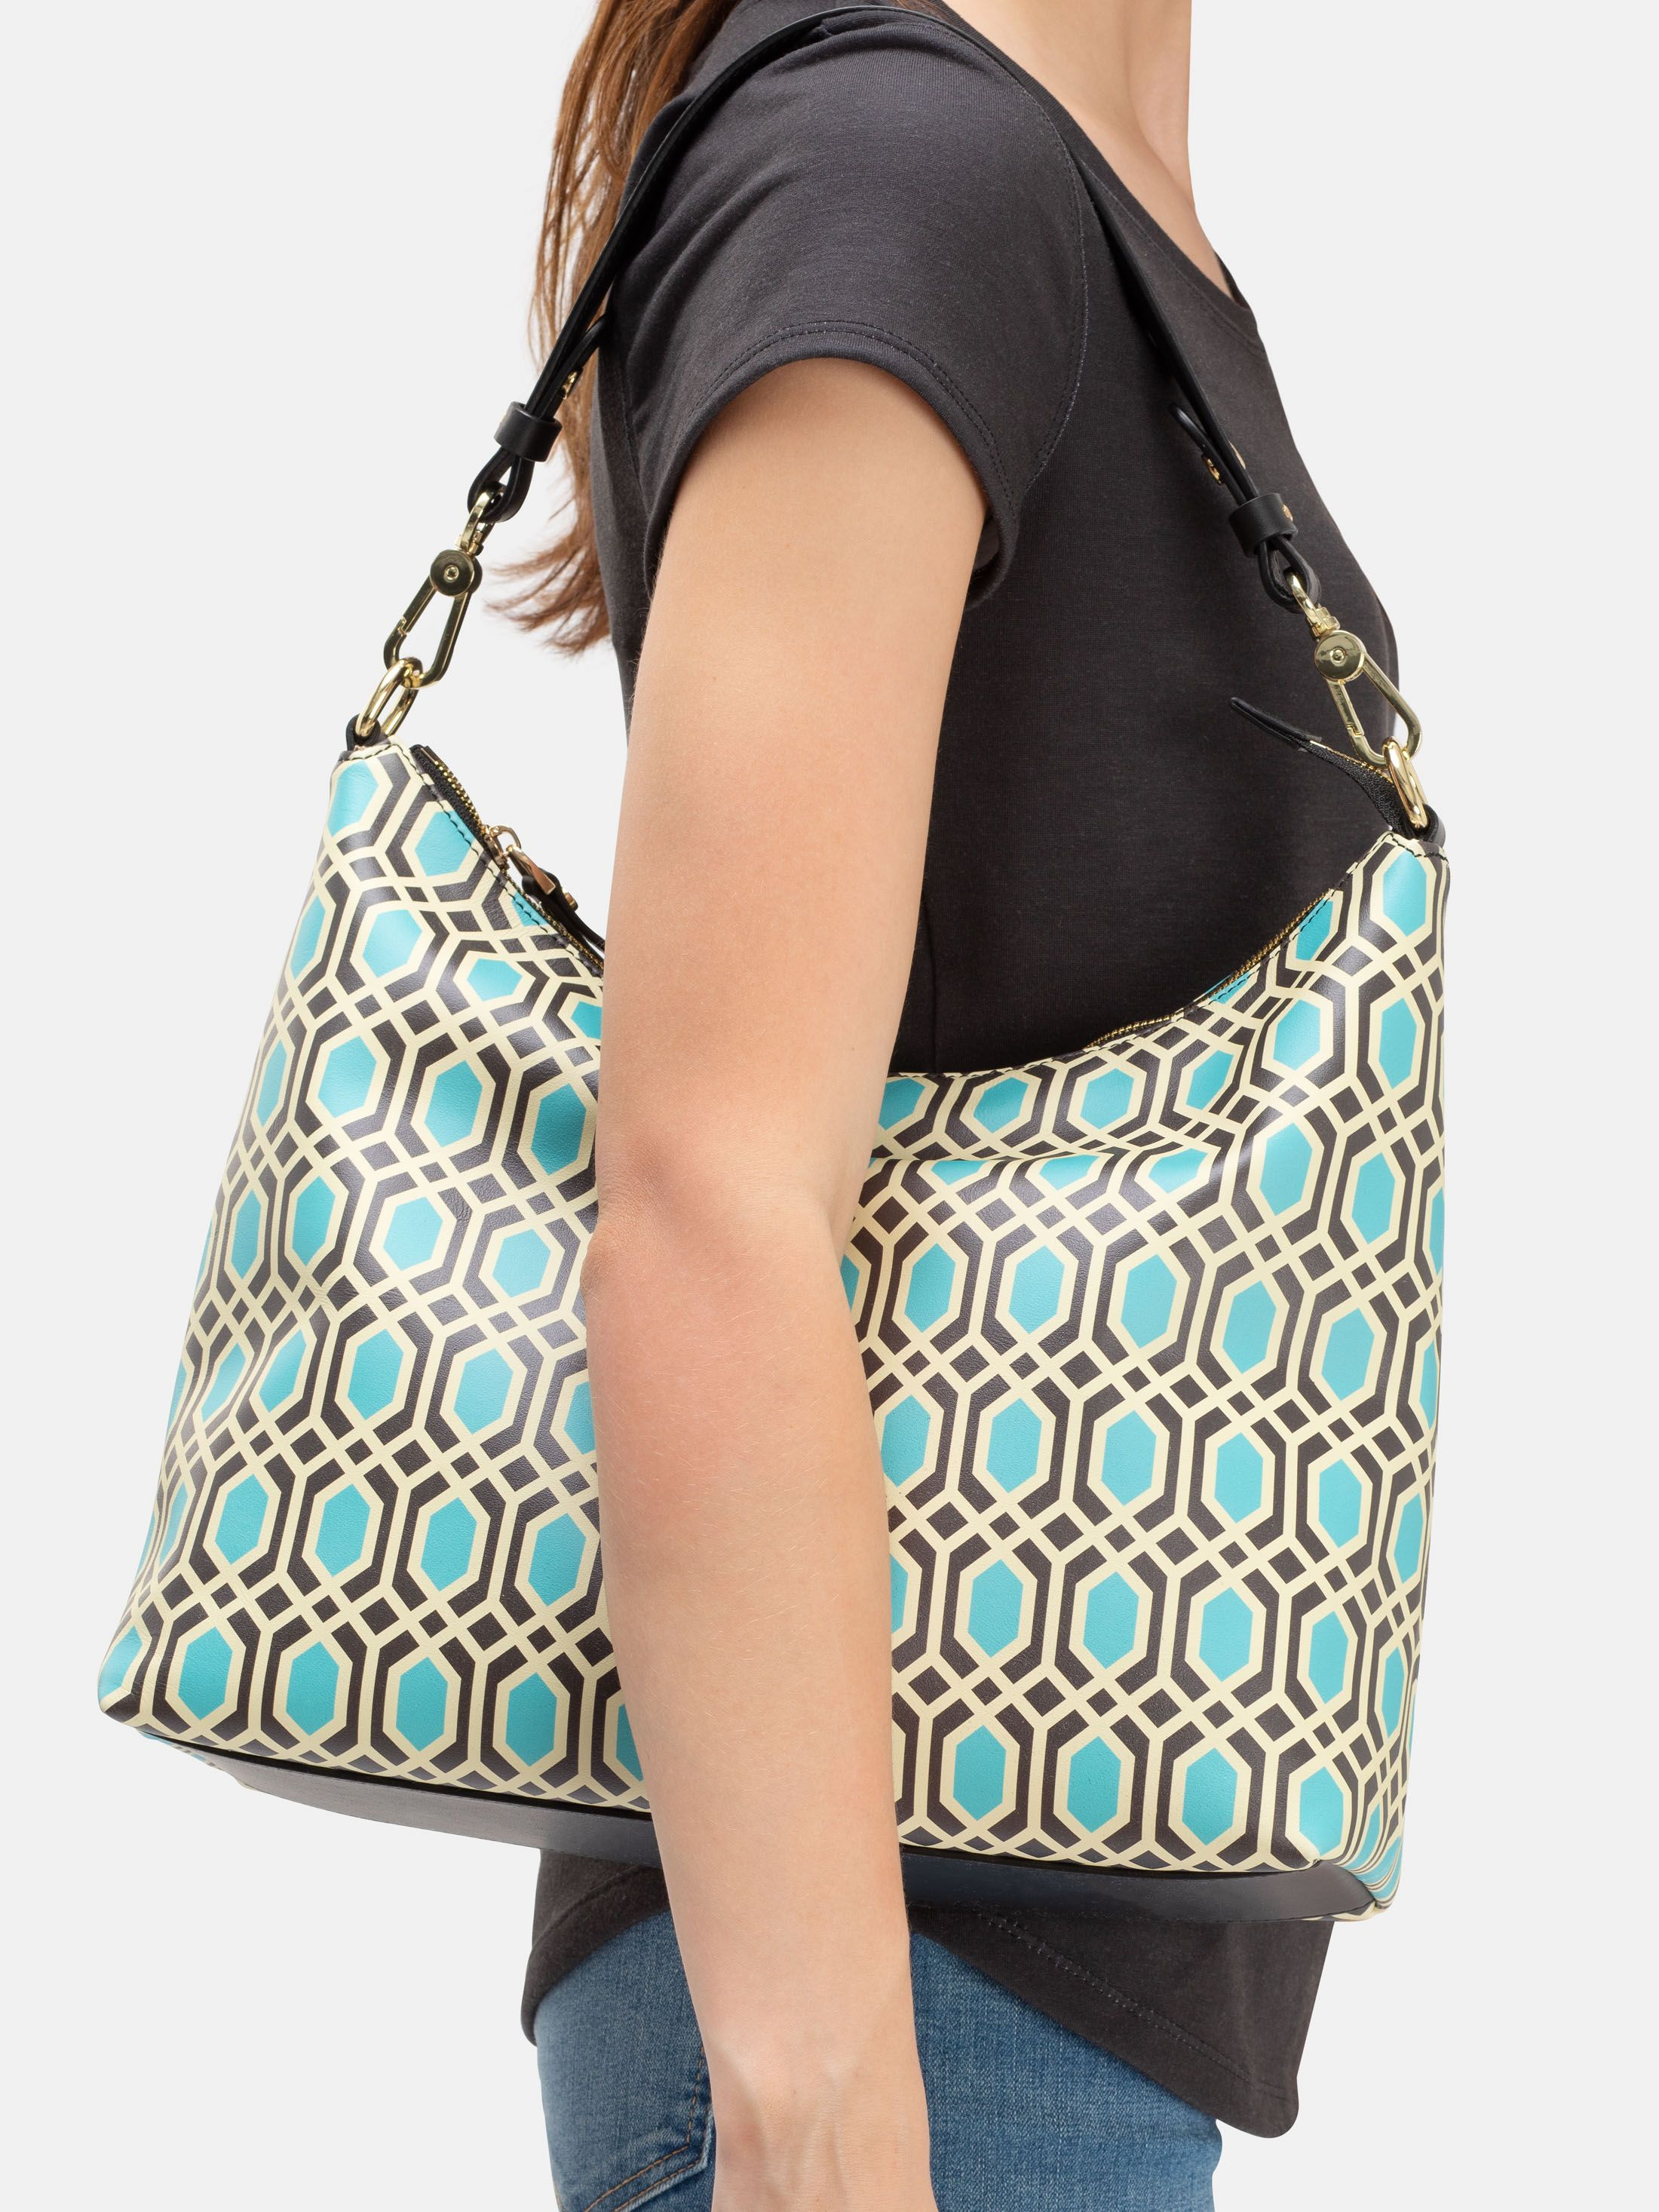 gepersonaliseerde hobo tassen